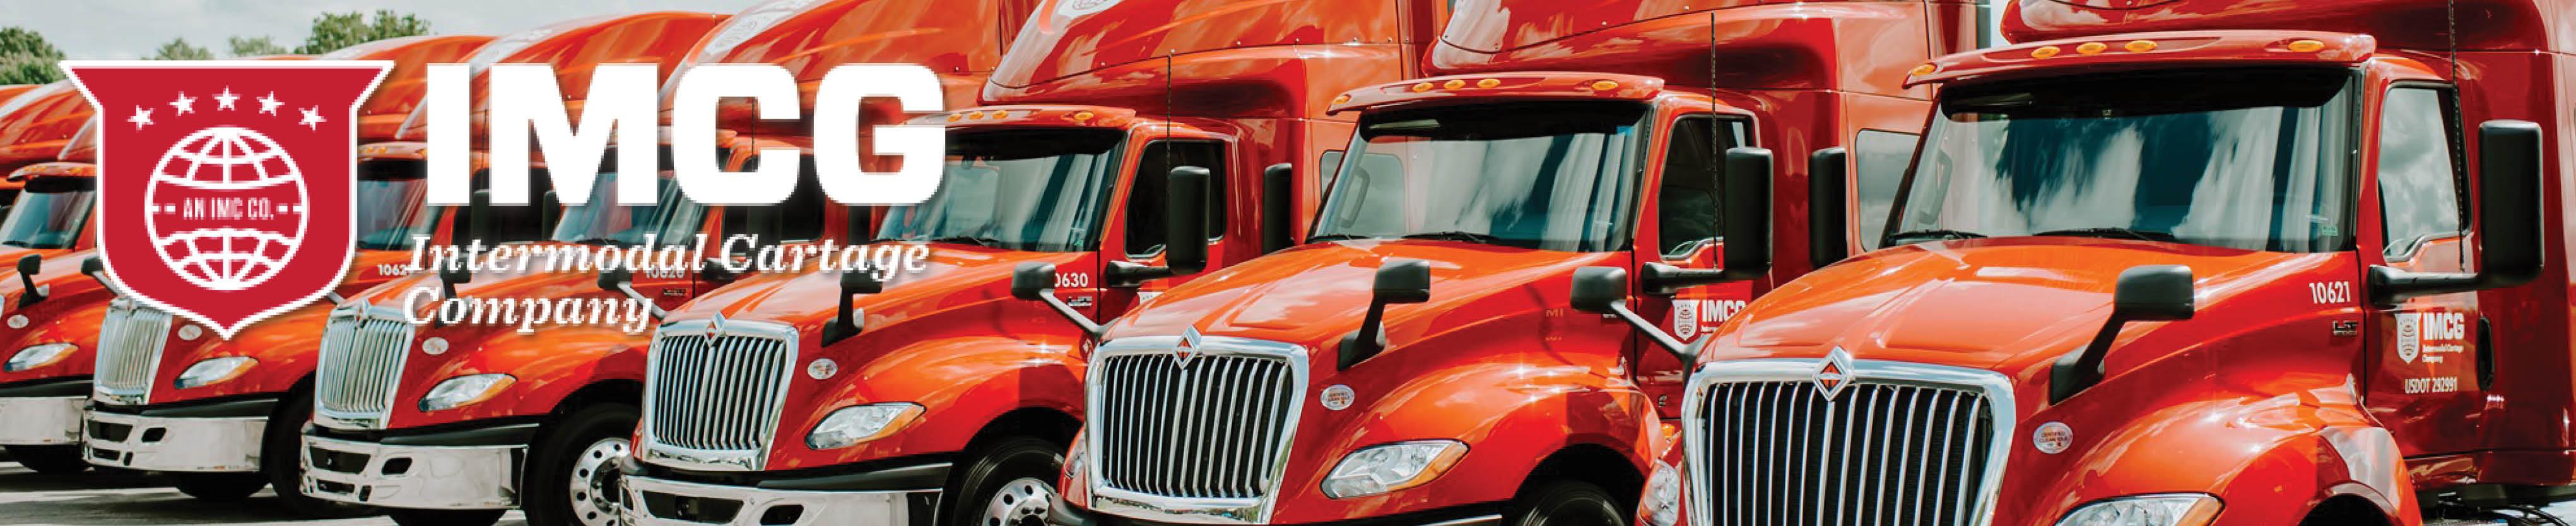 Intermodal Owner Operators Wanted!! - transportation - job ...